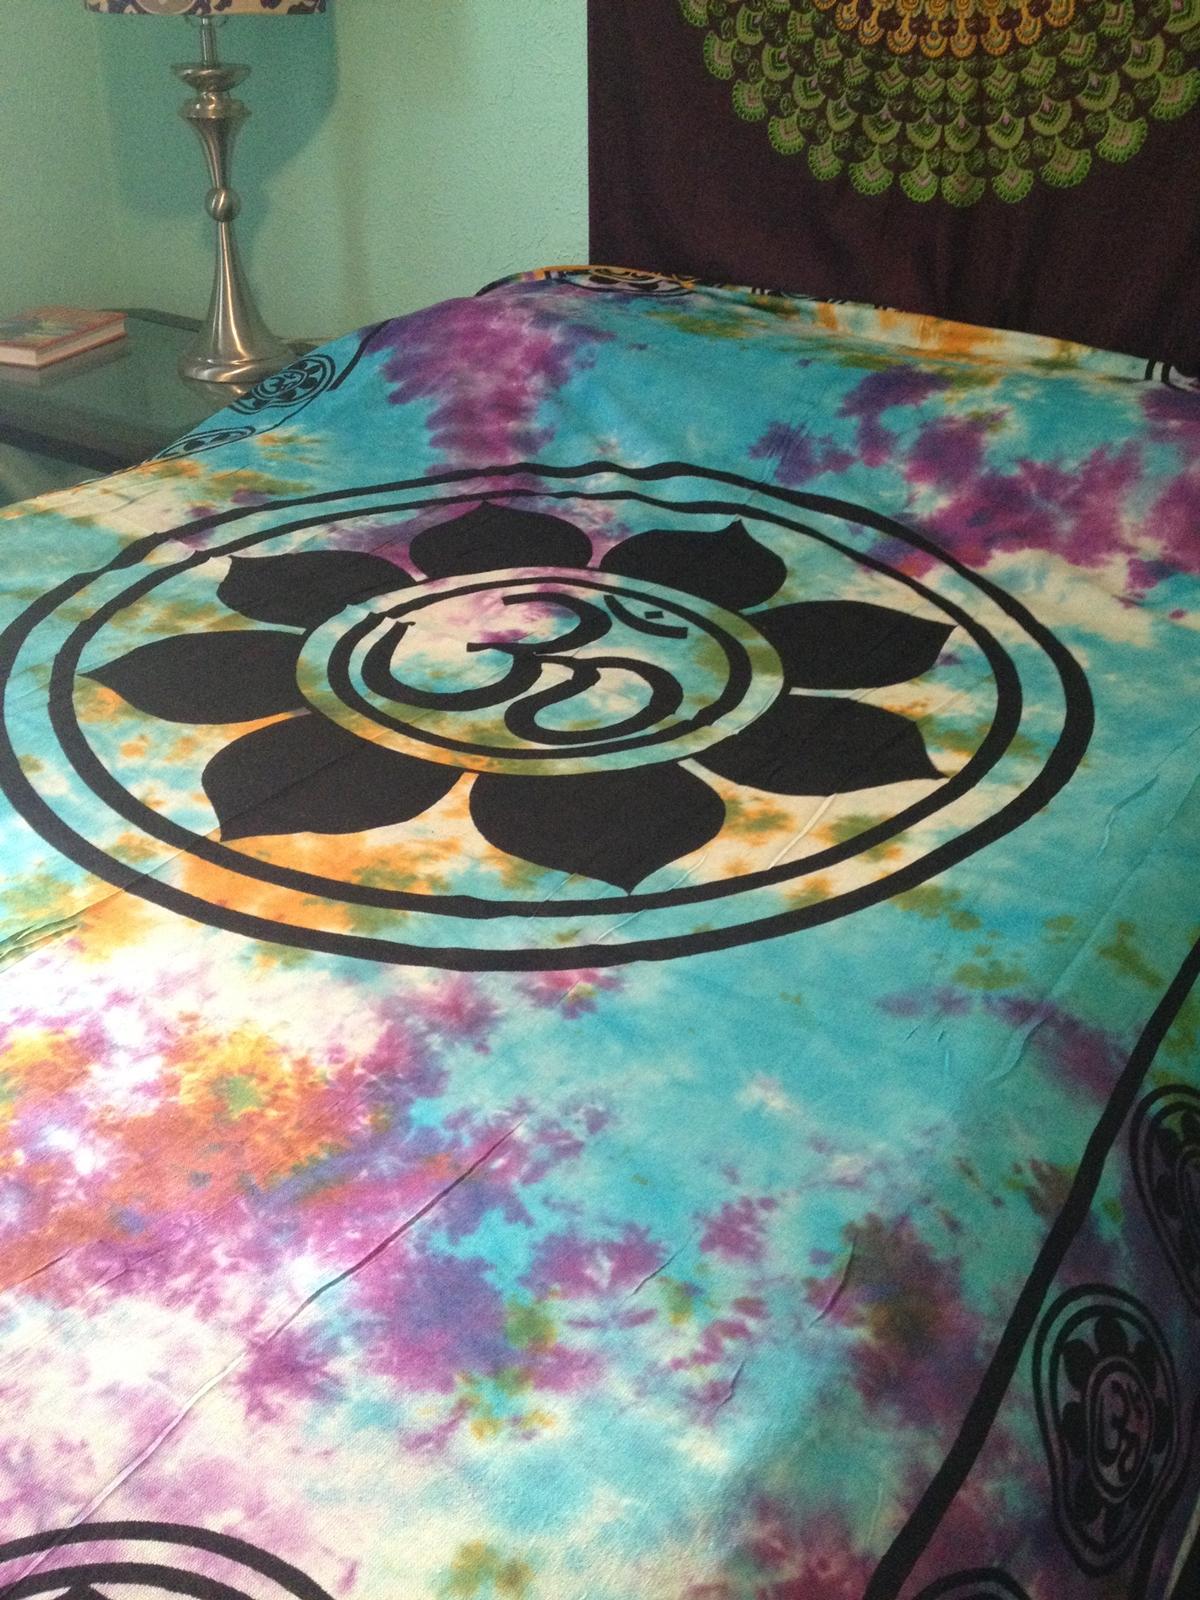 Om Aum Yoga Indian Lotus Flower India Hippie Boho Tie Dye